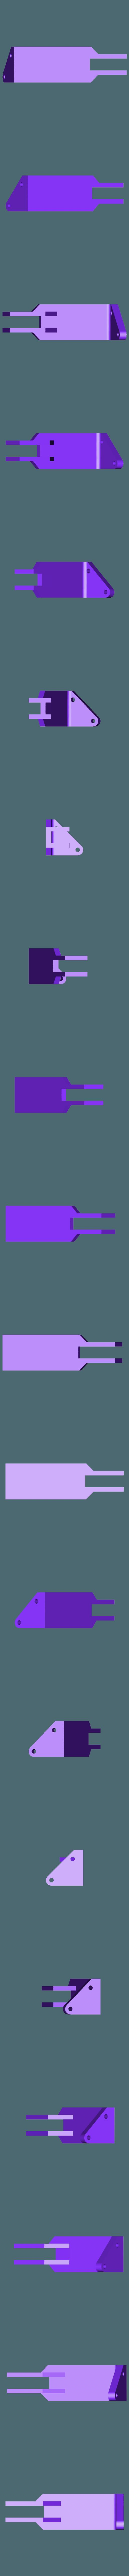 end_stop_y_gb_v6.stl Download free STL file ZDV SPHERE-O-BOT (light remix) • Object to 3D print, jurekkb